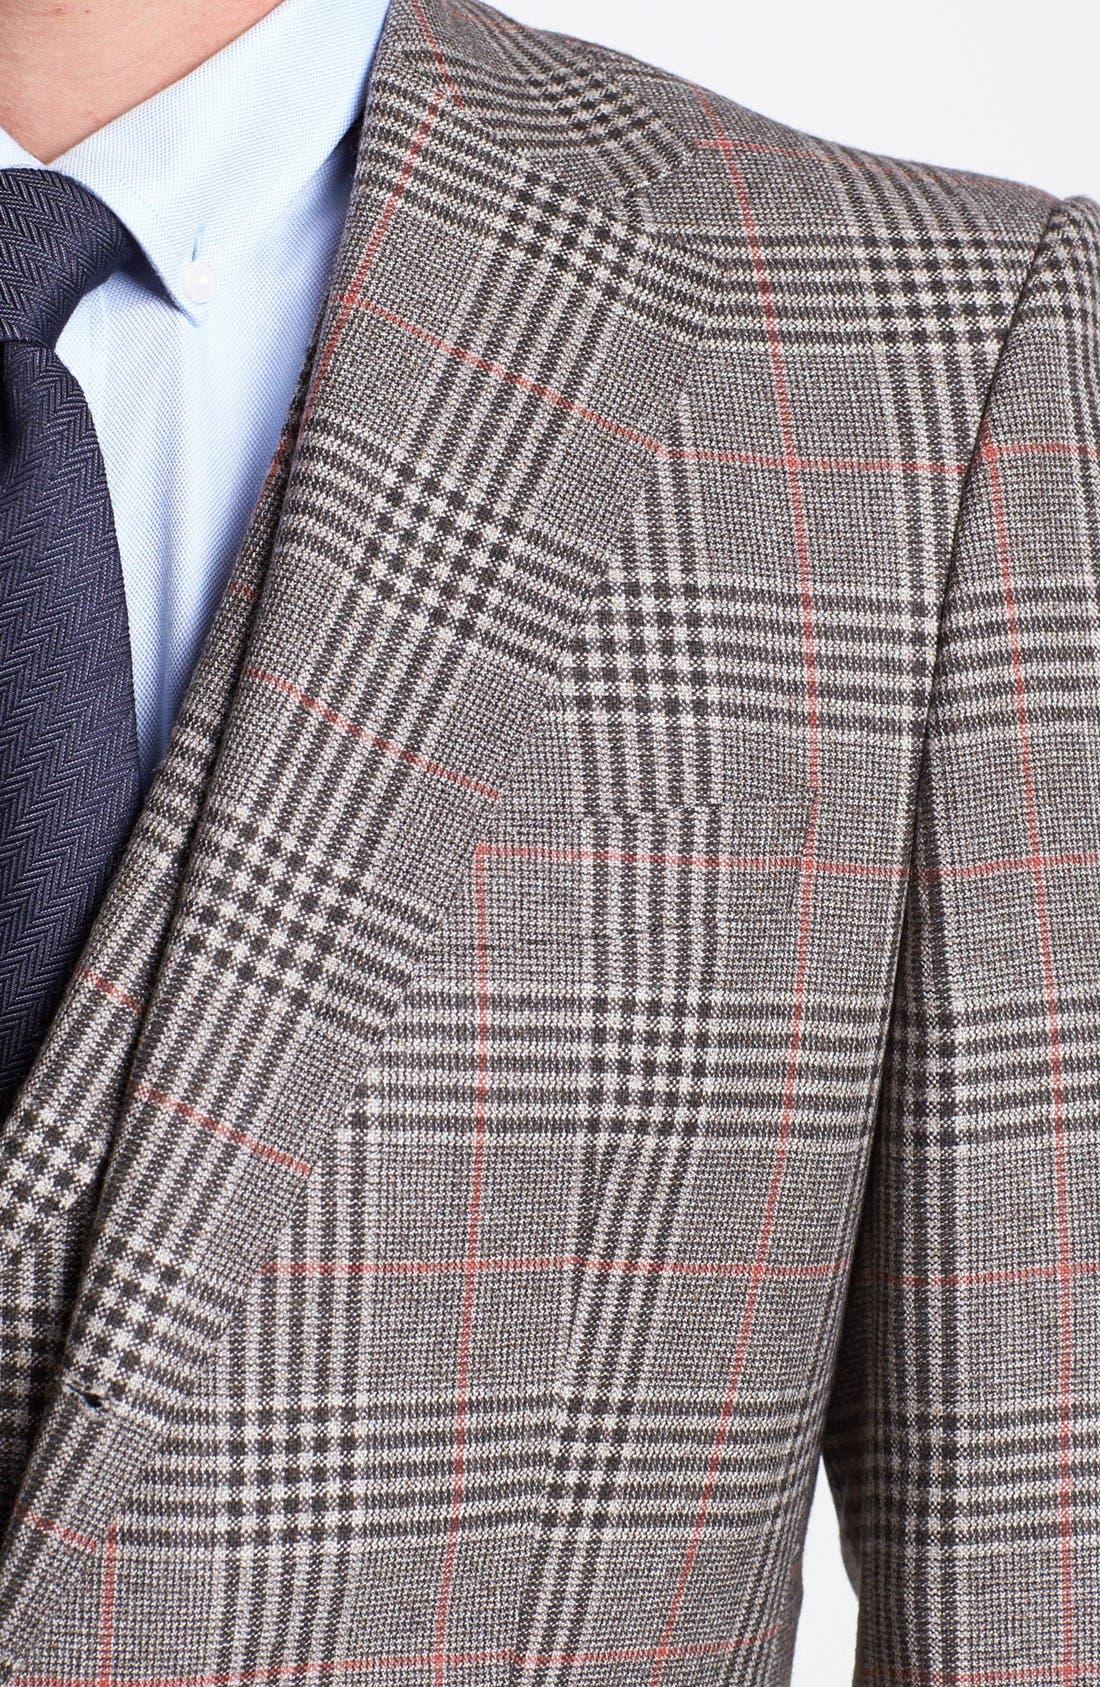 Alternate Image 2  - BOSS HUGO BOSS 'Dunham/Knight' Trim Fit Three Piece Suit (Online Only)